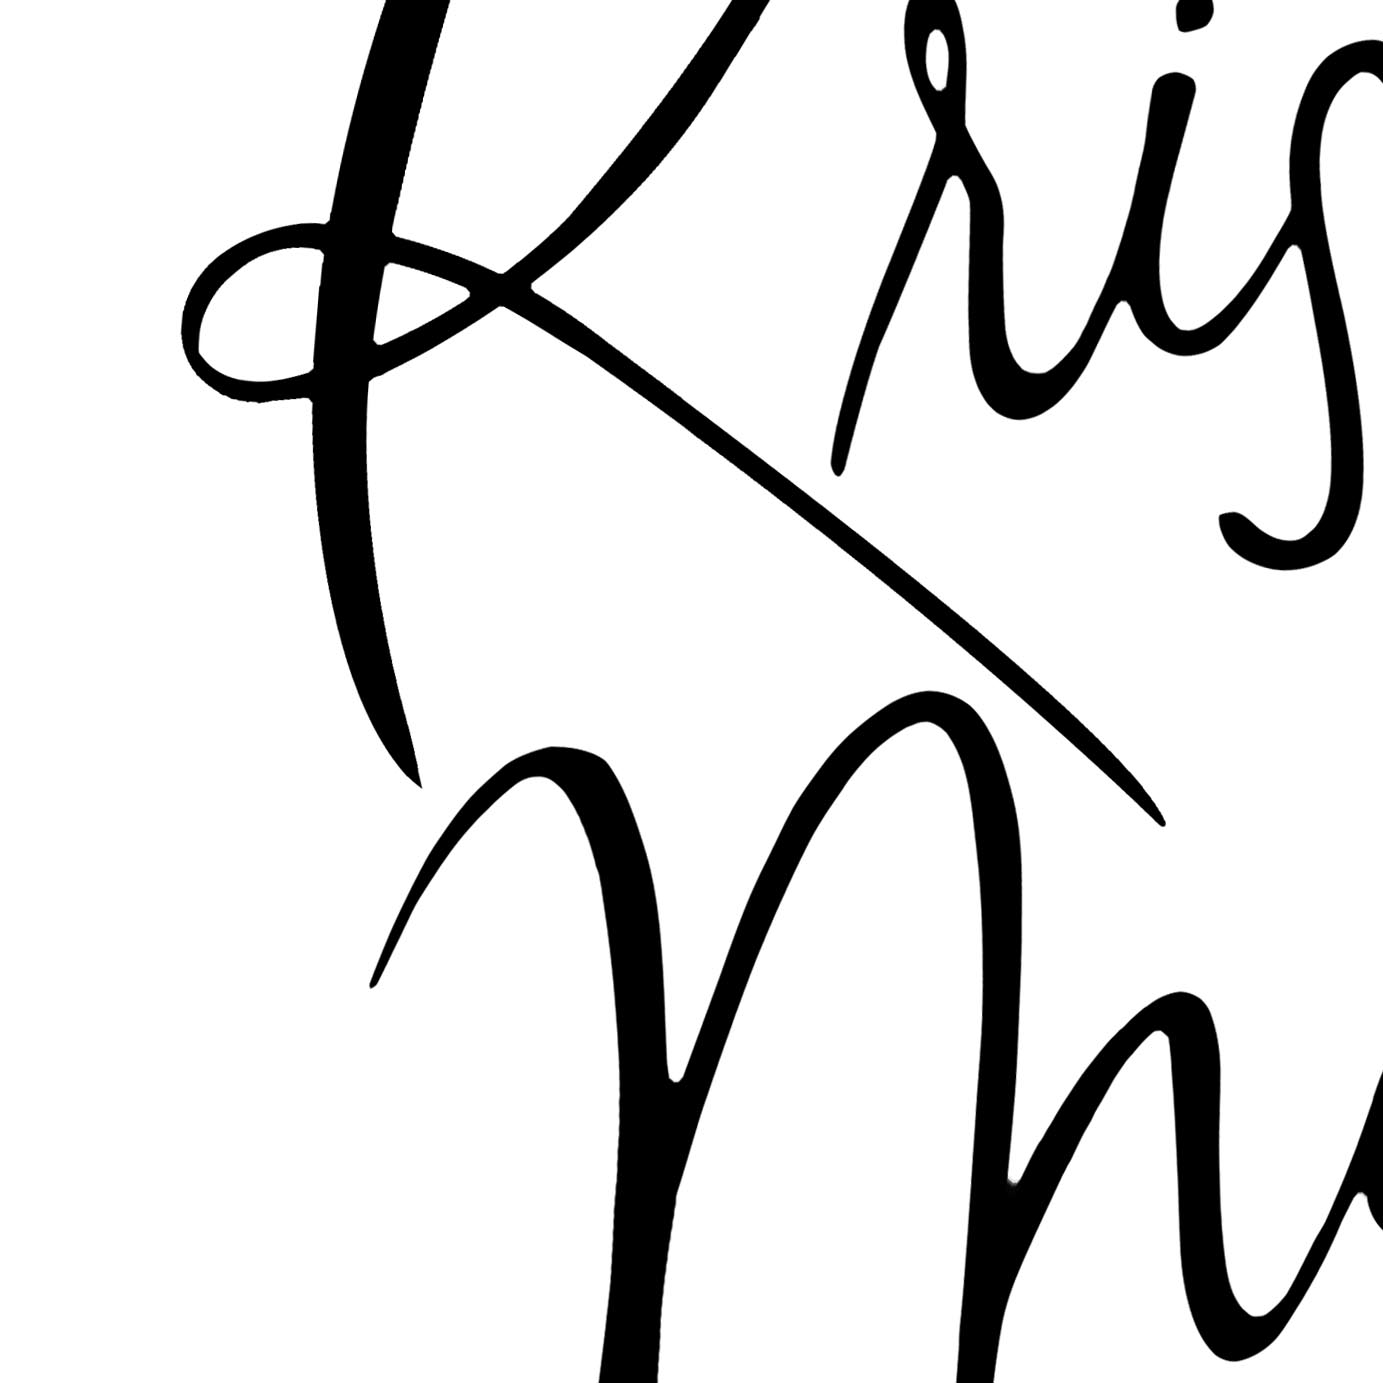 Hand-lettered logo design by Ashley Bush